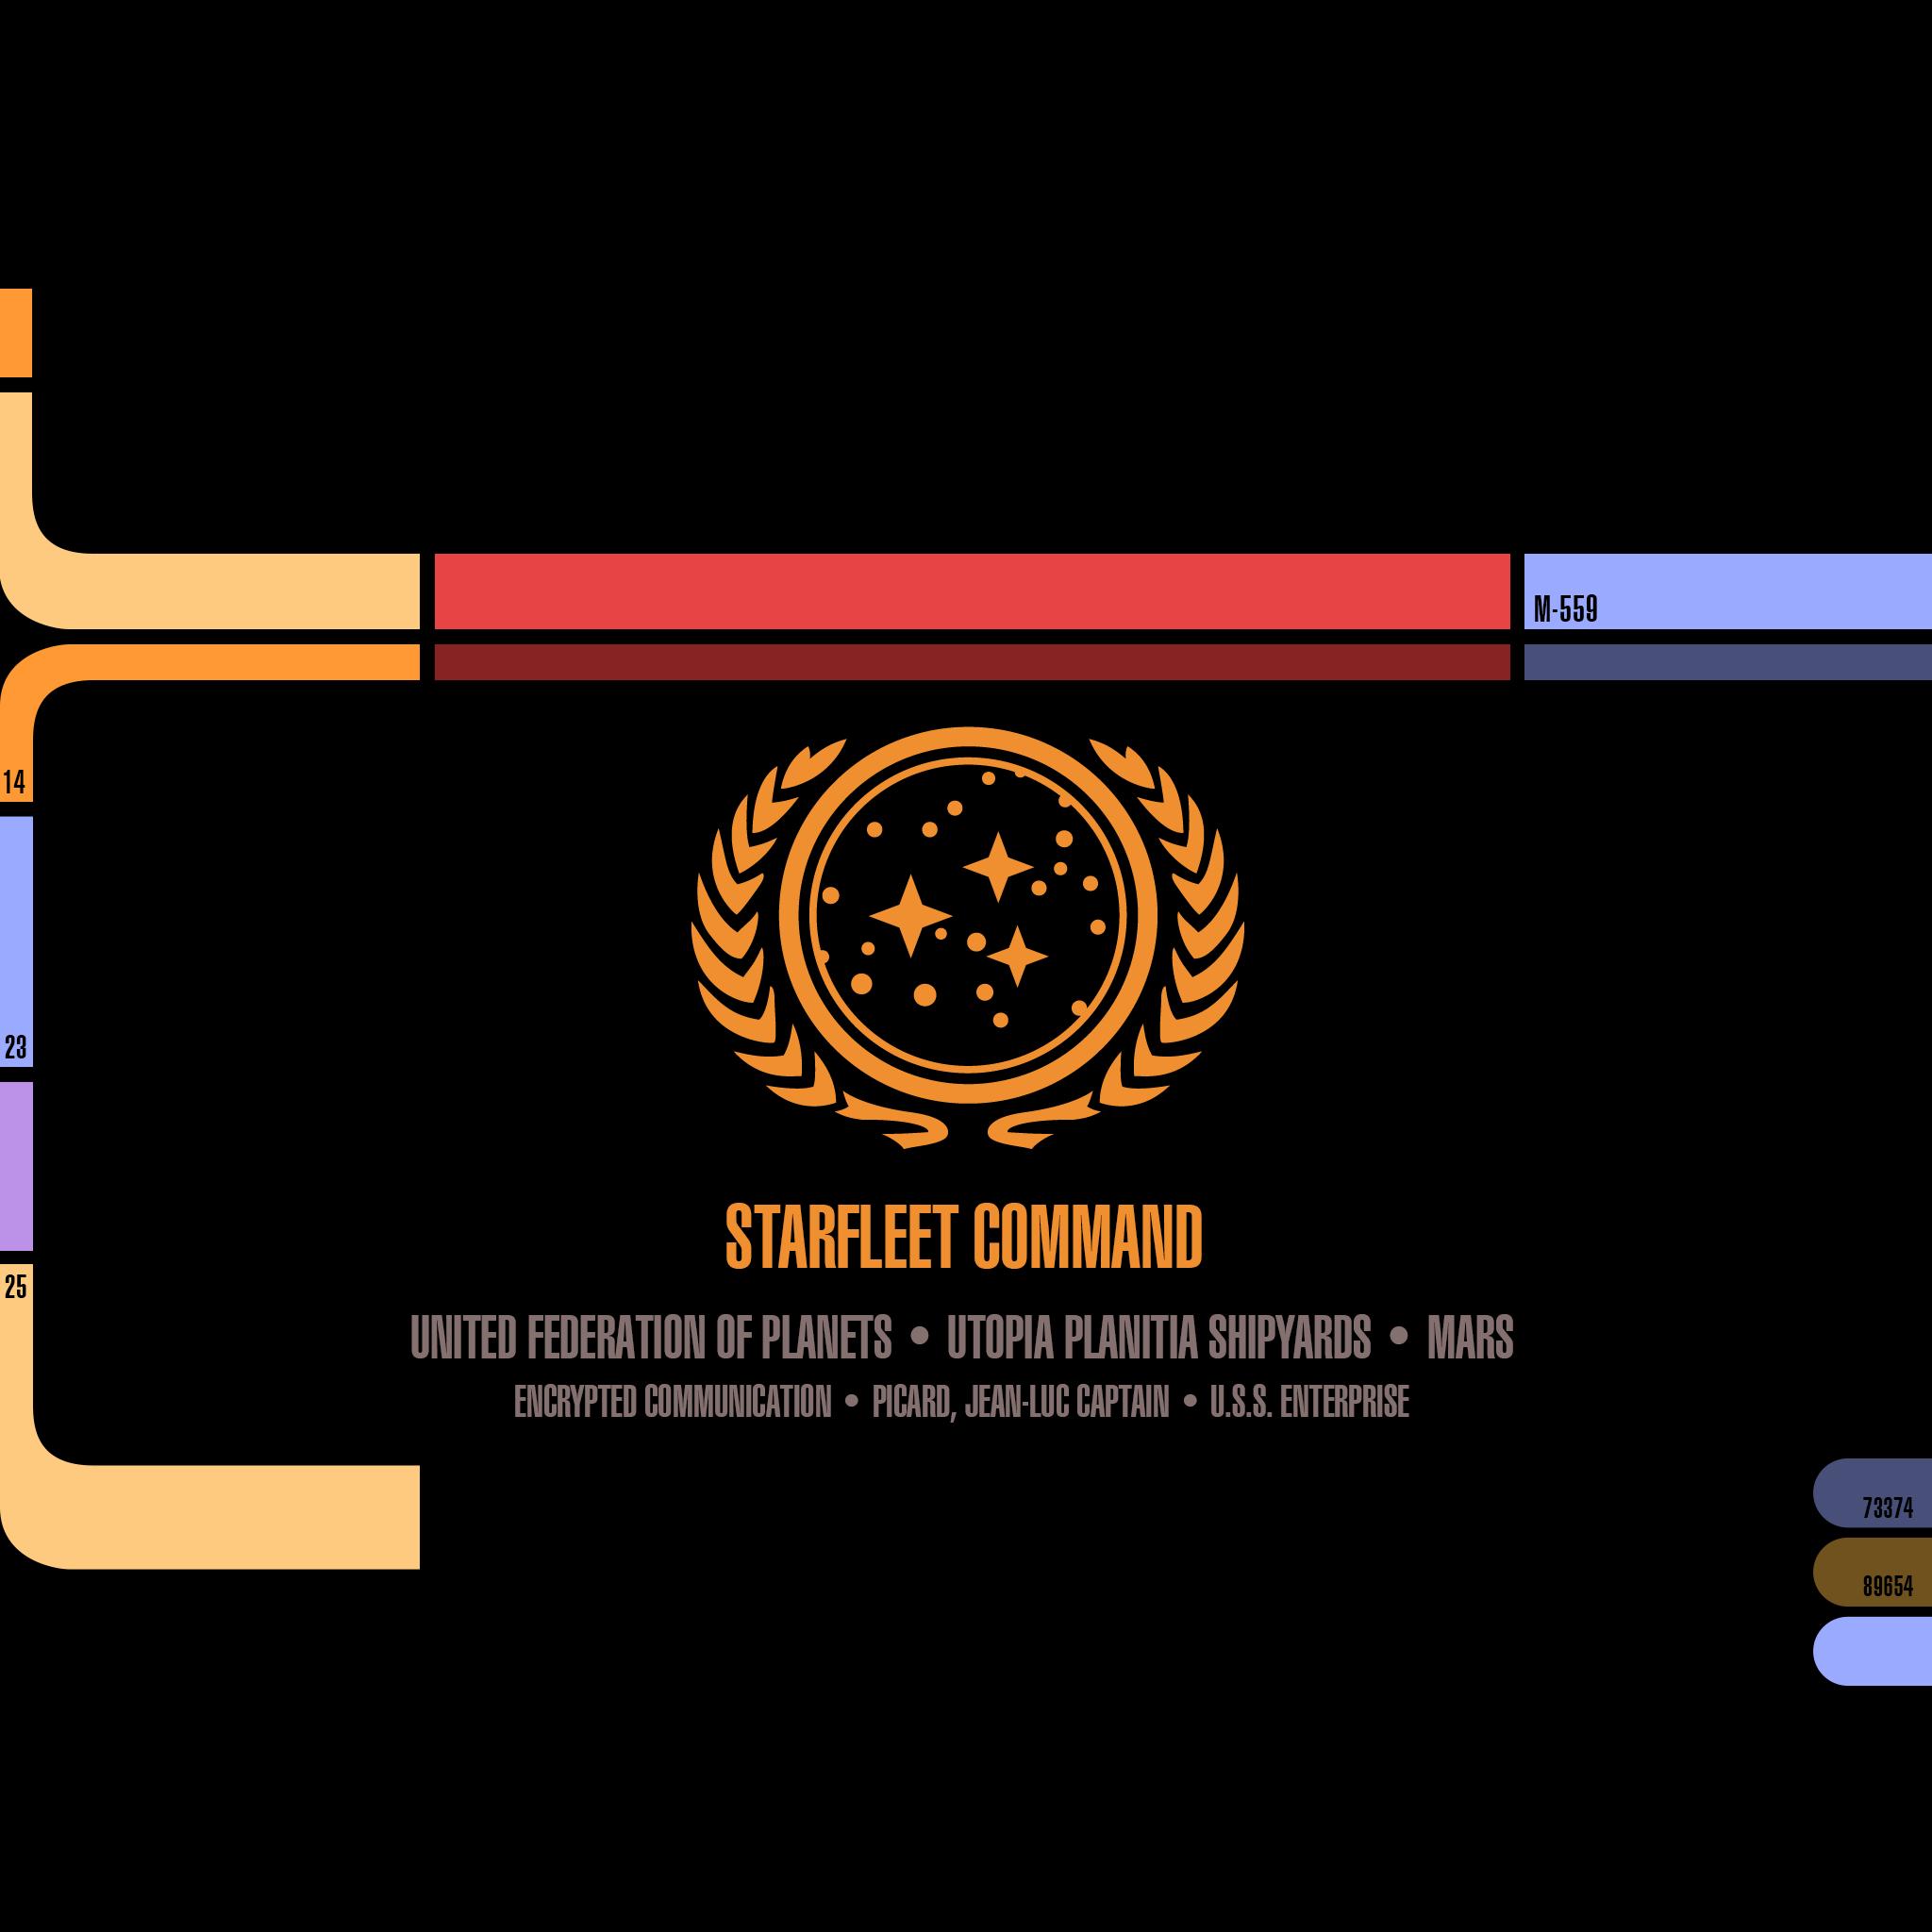 Star Trek Next Gen Wallpapers for iPad gedblog 2048x2048